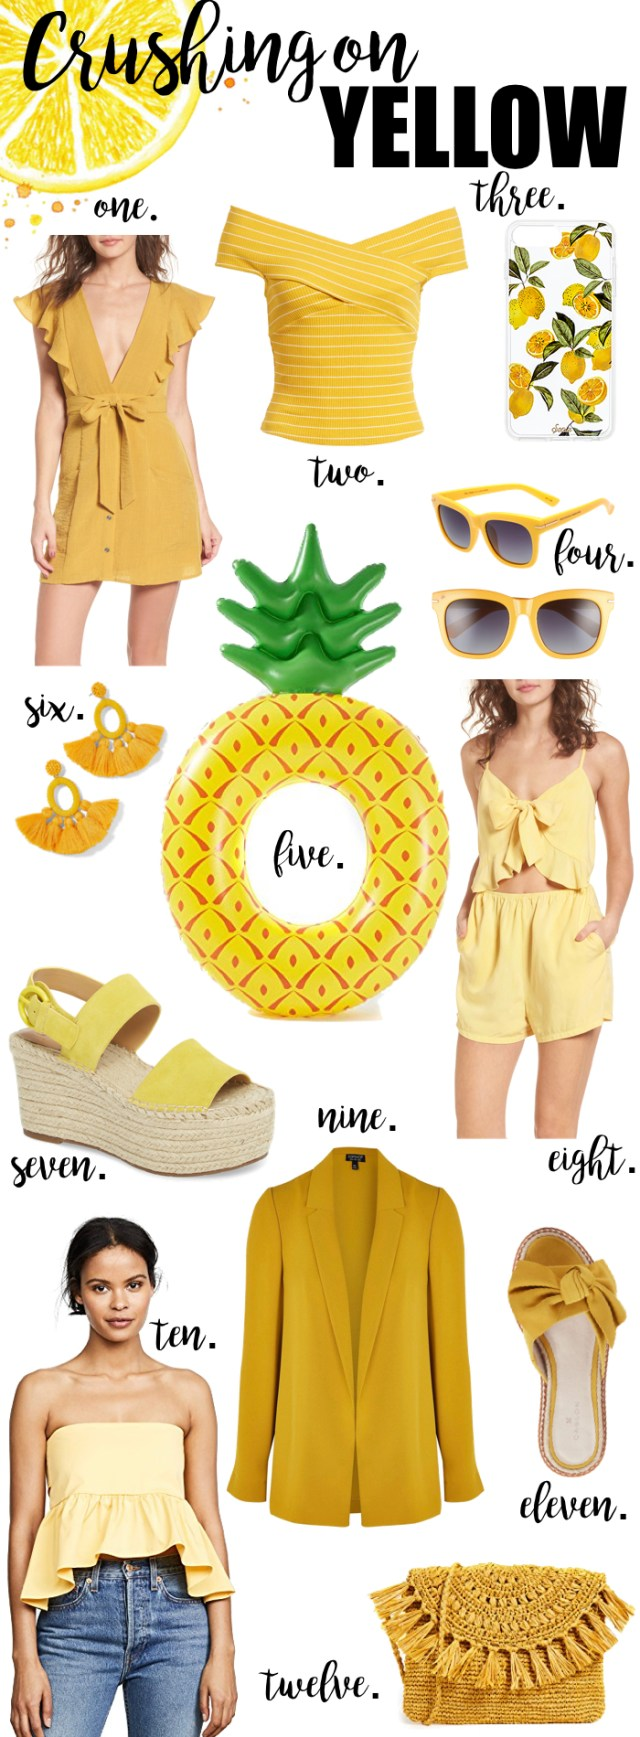 Crushing on Yellow, Yellow collage, Yellow fashion